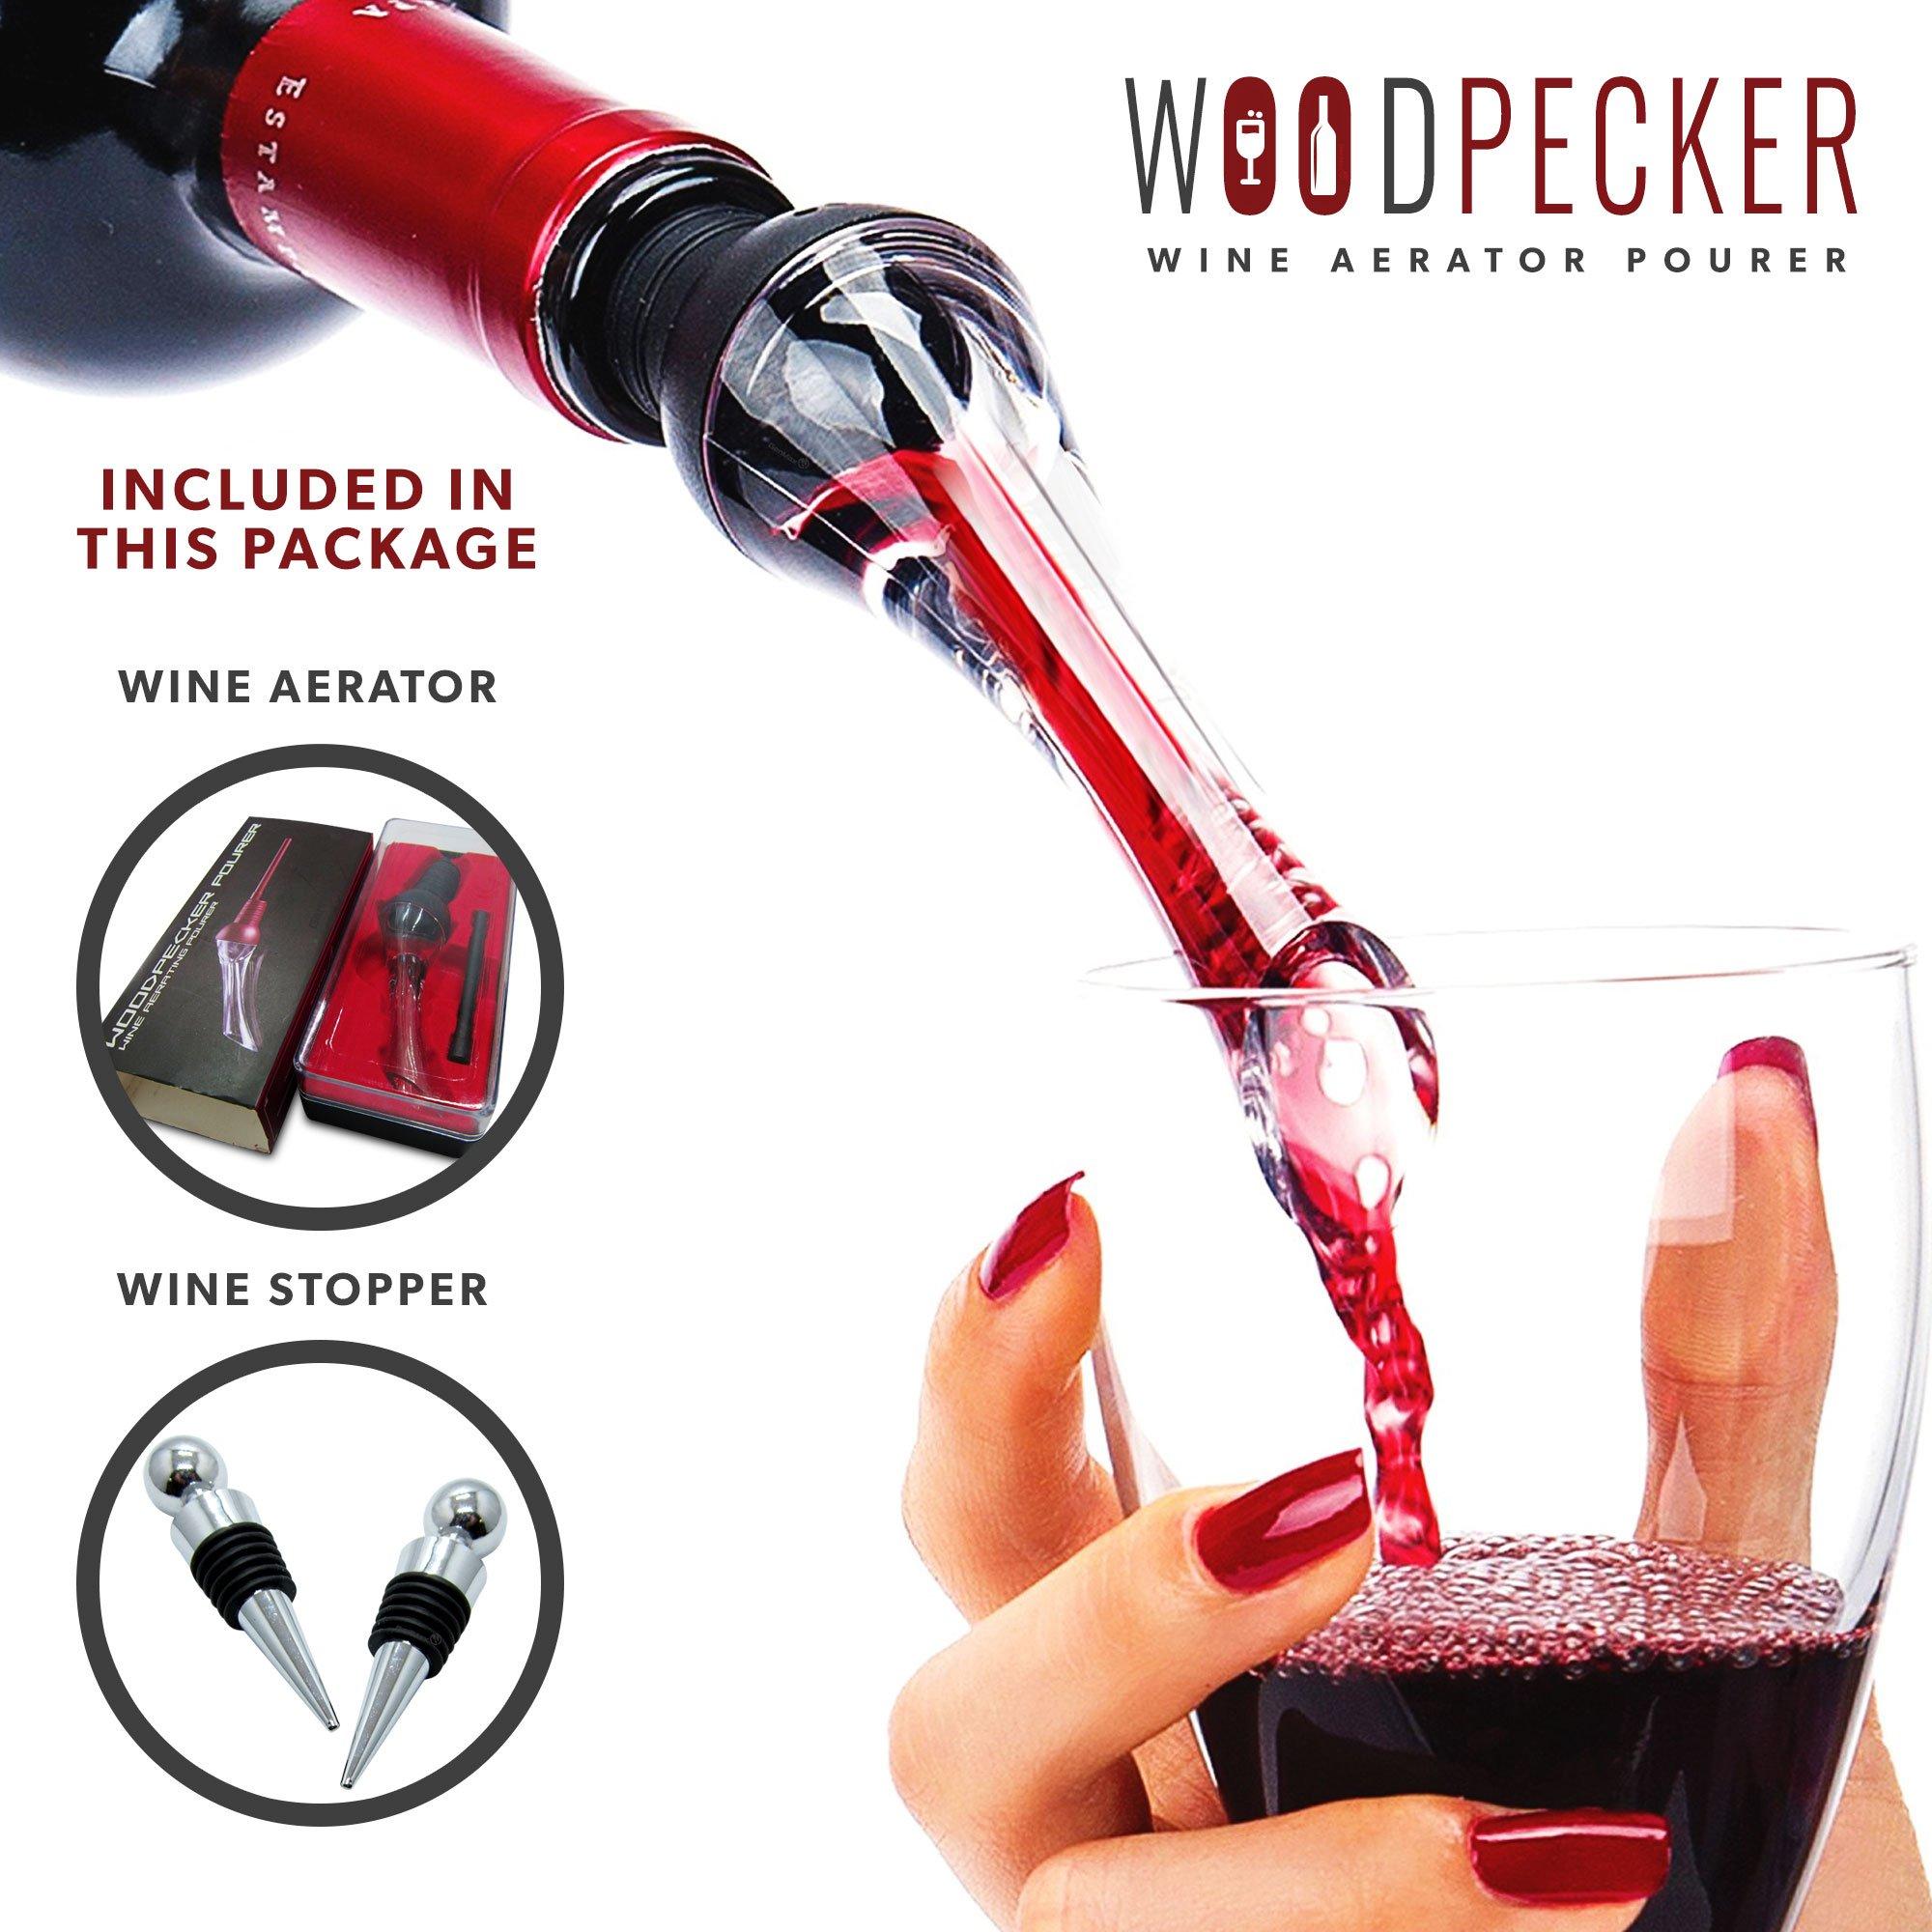 GenMax Aerating Wine Pourer - In Bottle Wine Aerator & Decanter - Ergonomic Spout Tip - Larger Chamber For Better Aeration - Better Tasting Wine - Easy To Clean Liquor Pourer - Wine Stopper Included!